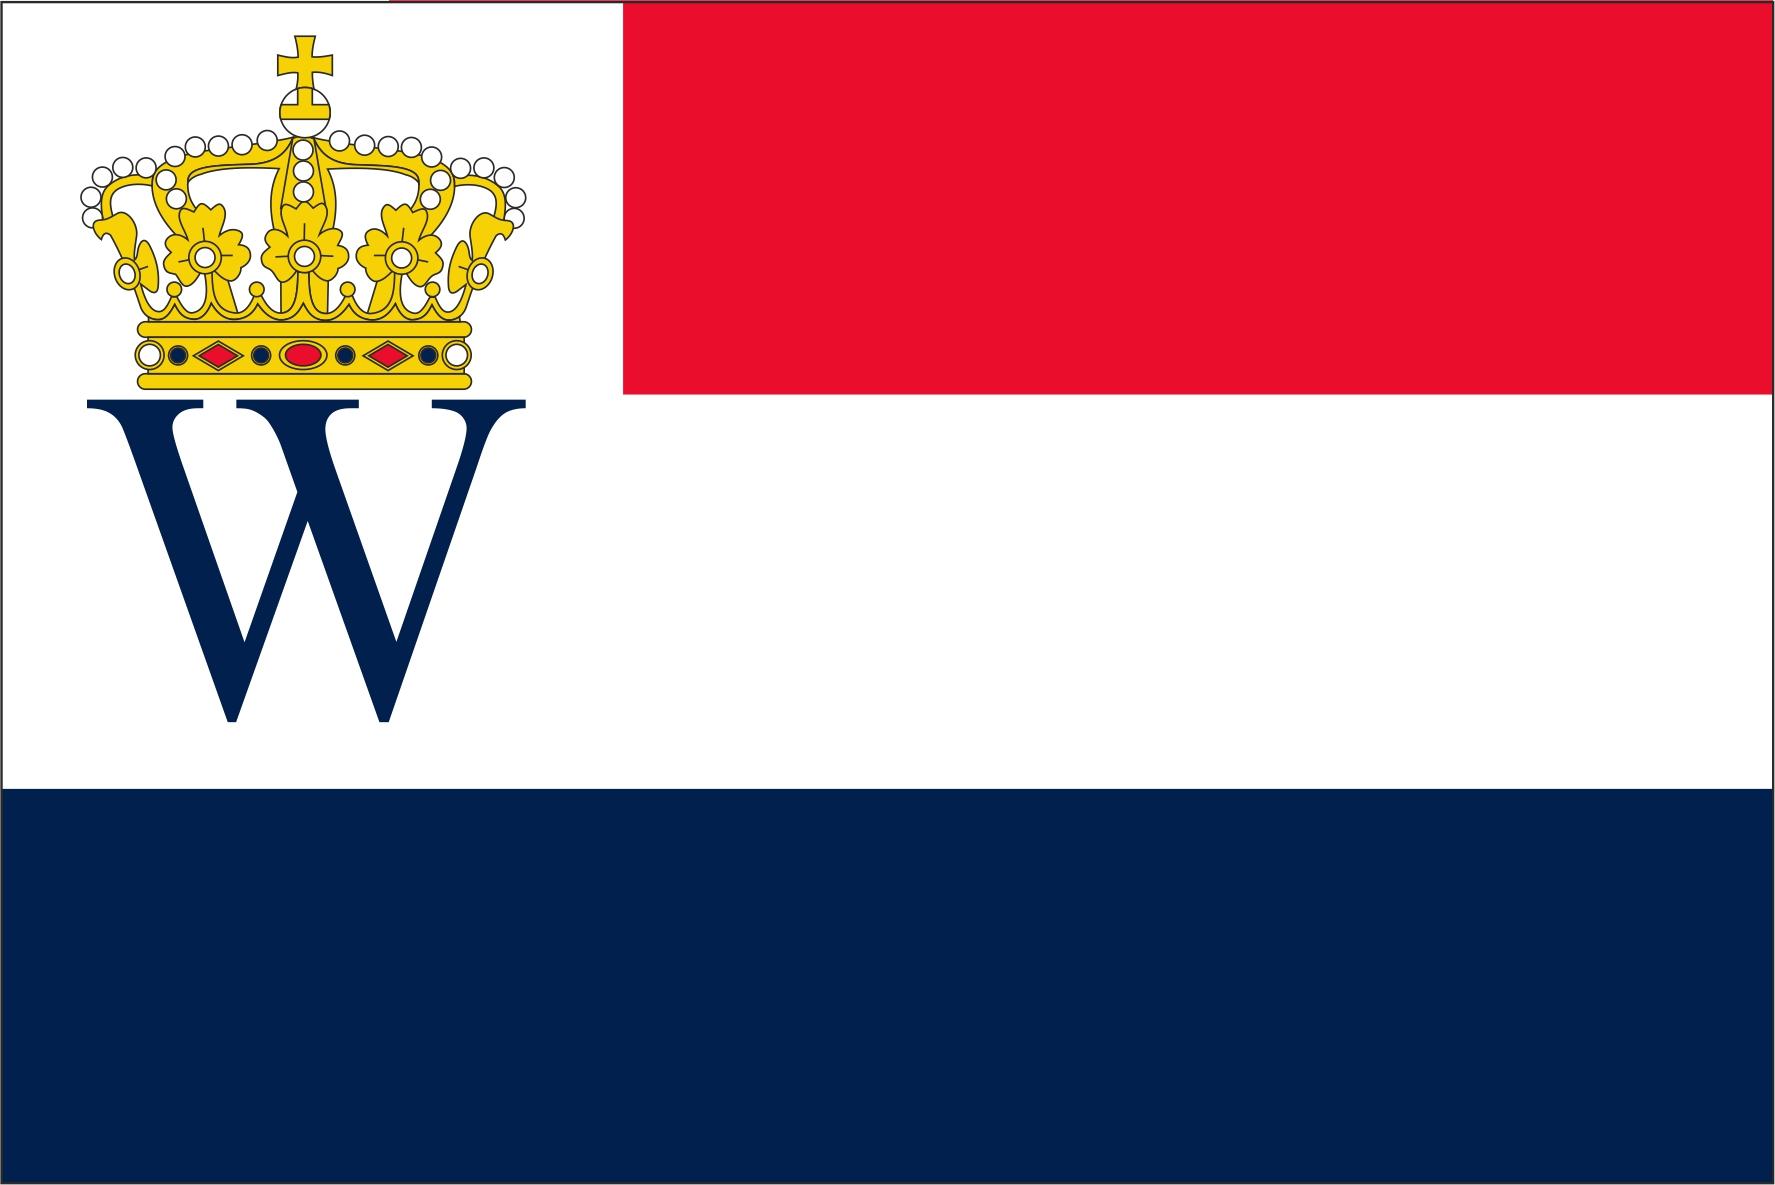 Koninklijke Watersport Vlag 150x225cm Oud Hollands